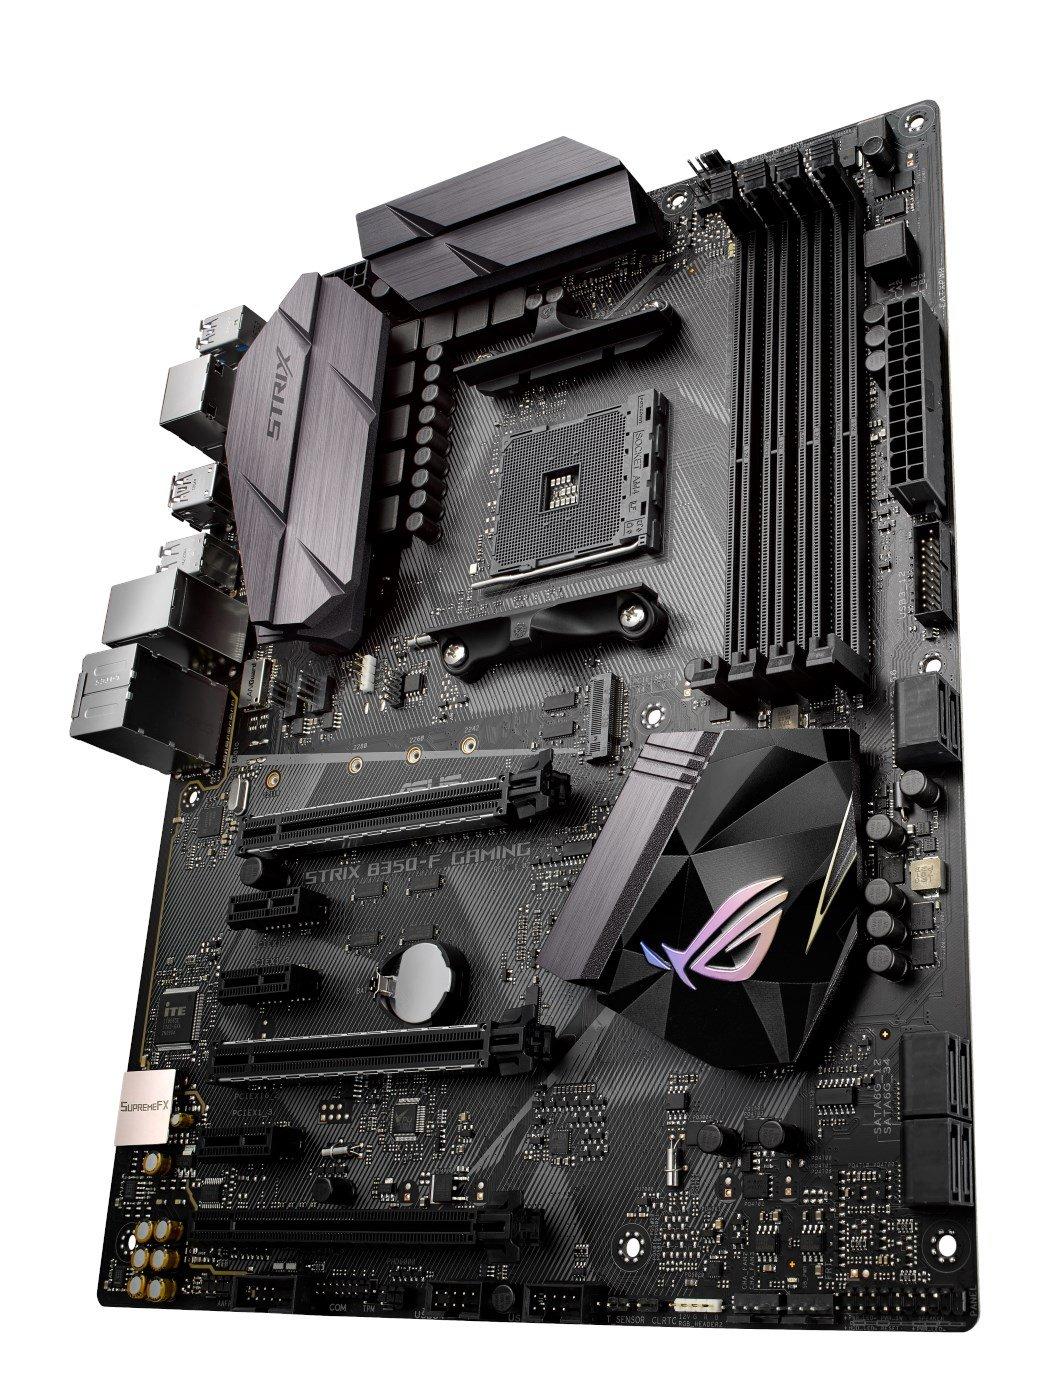 Asus ROG Strix B350-F Gaming AMD AM4 B350 Motherboard (ATX ...